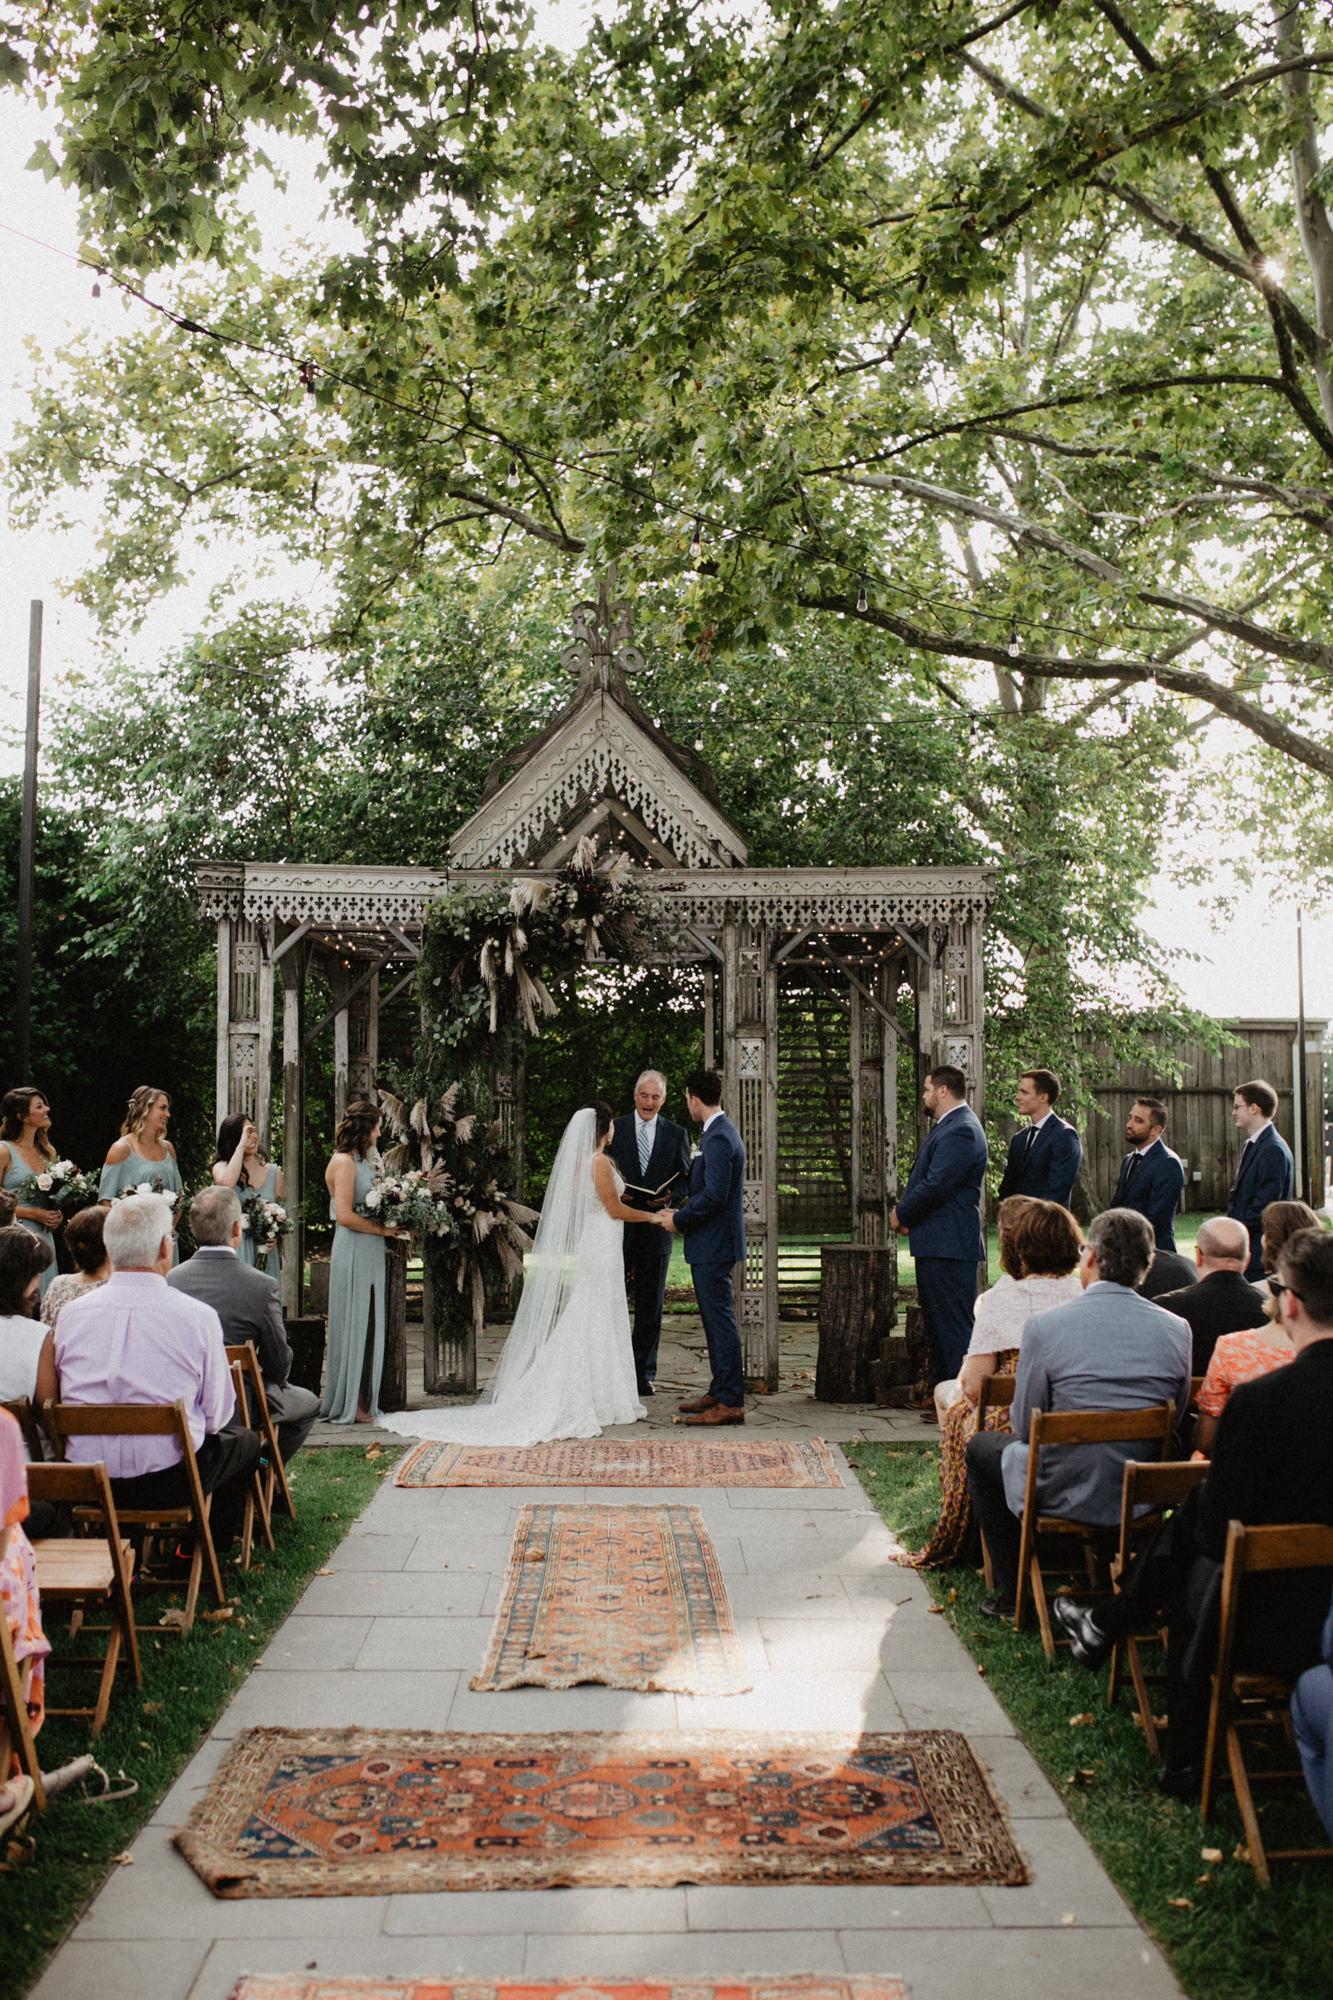 terrain-events-wedding-photographer-26.jpg